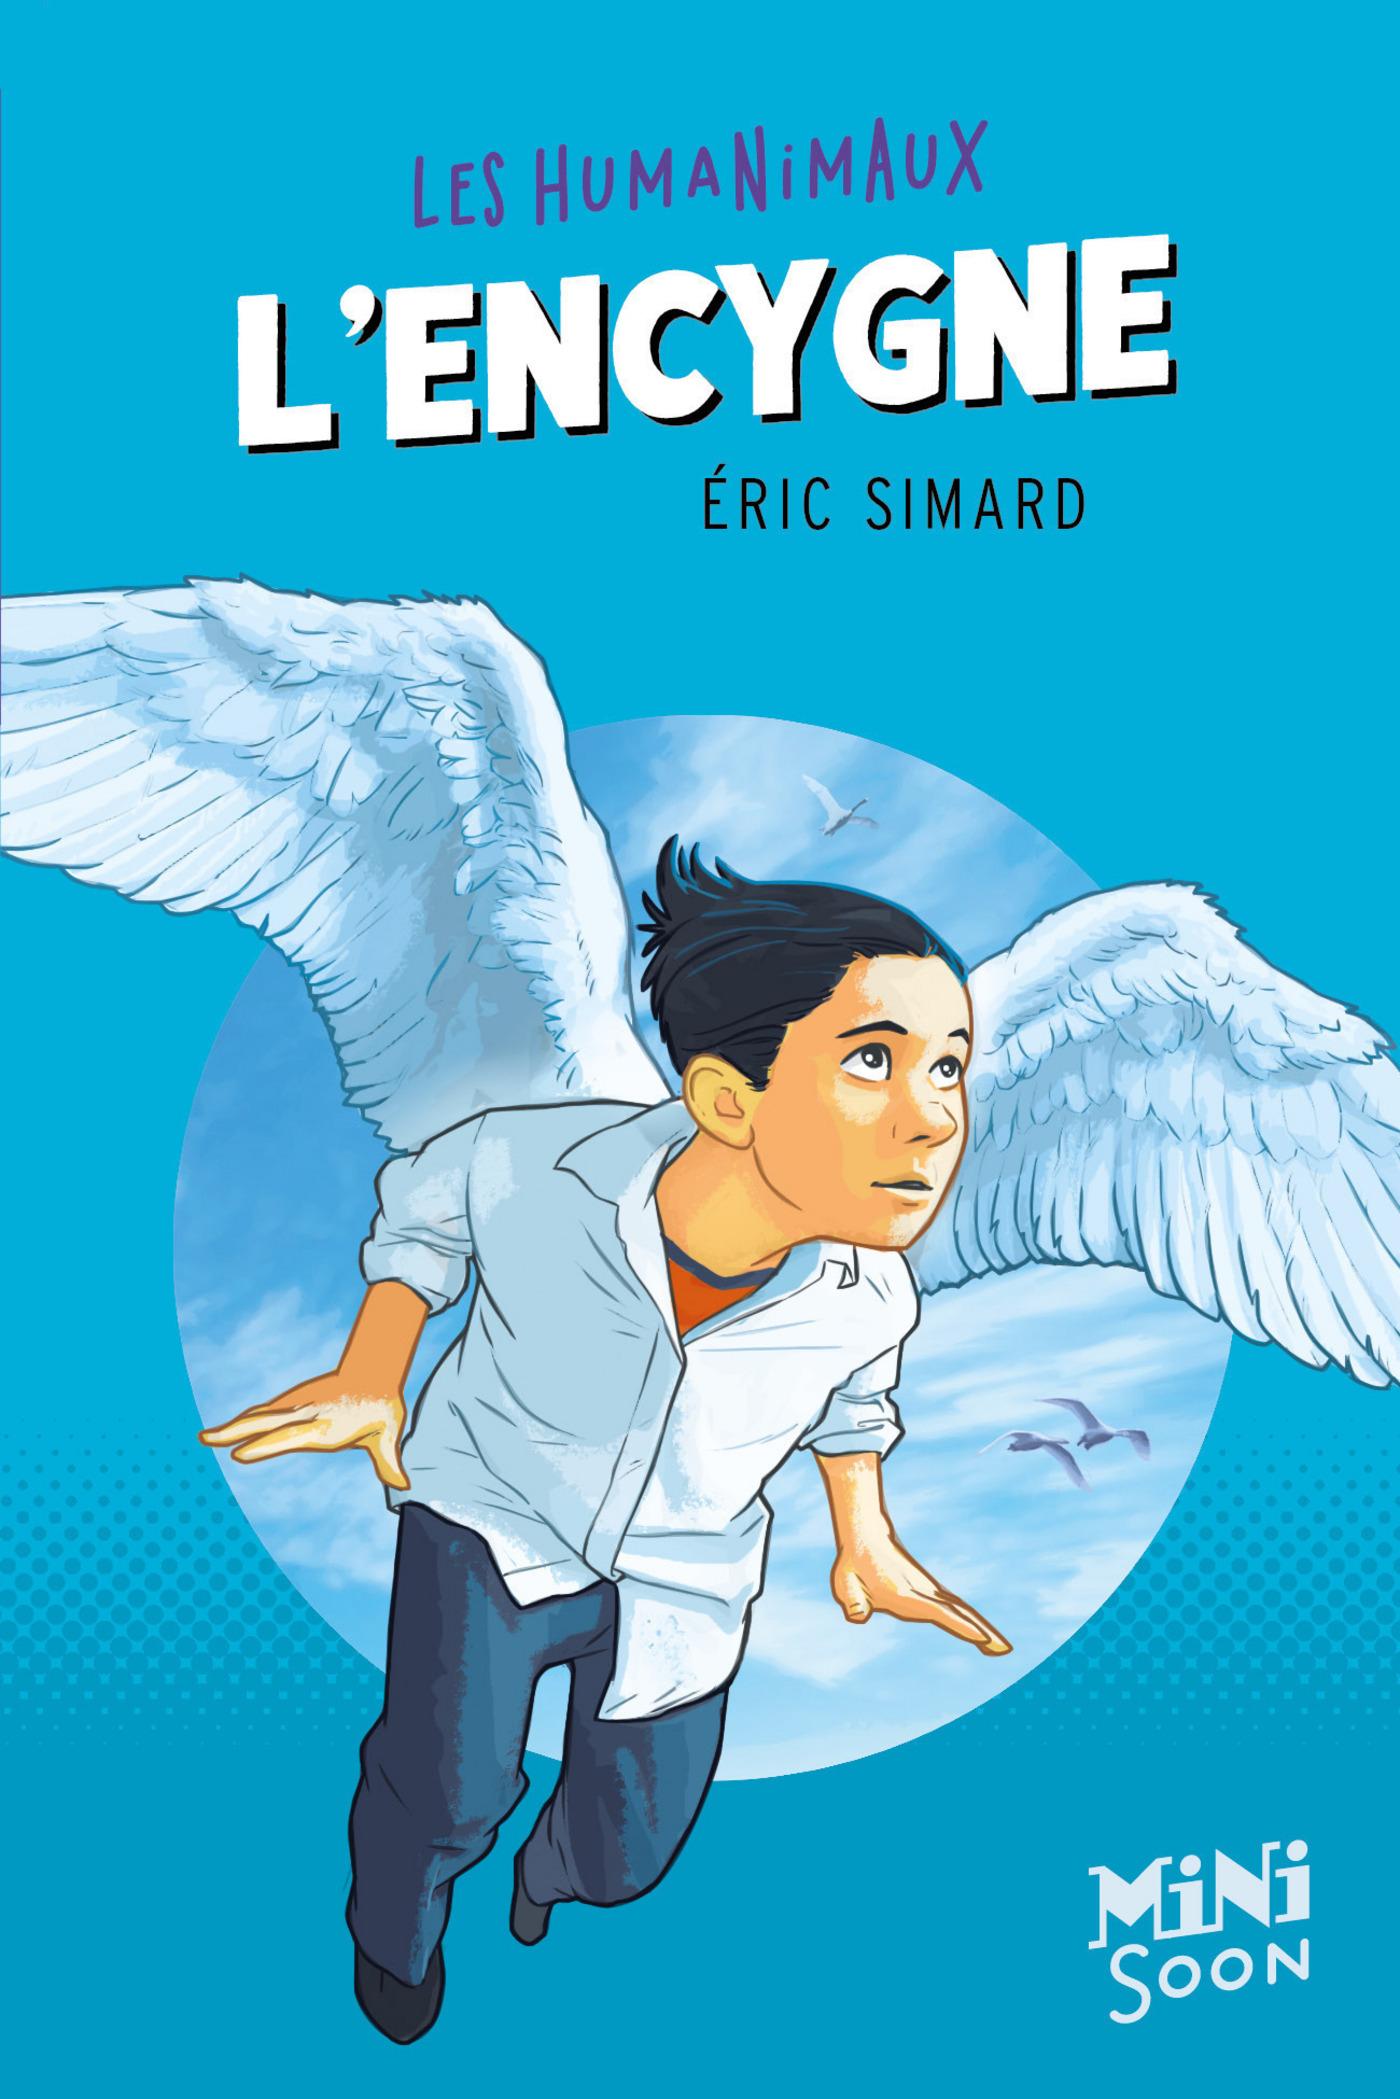 L'encygne (ebook)